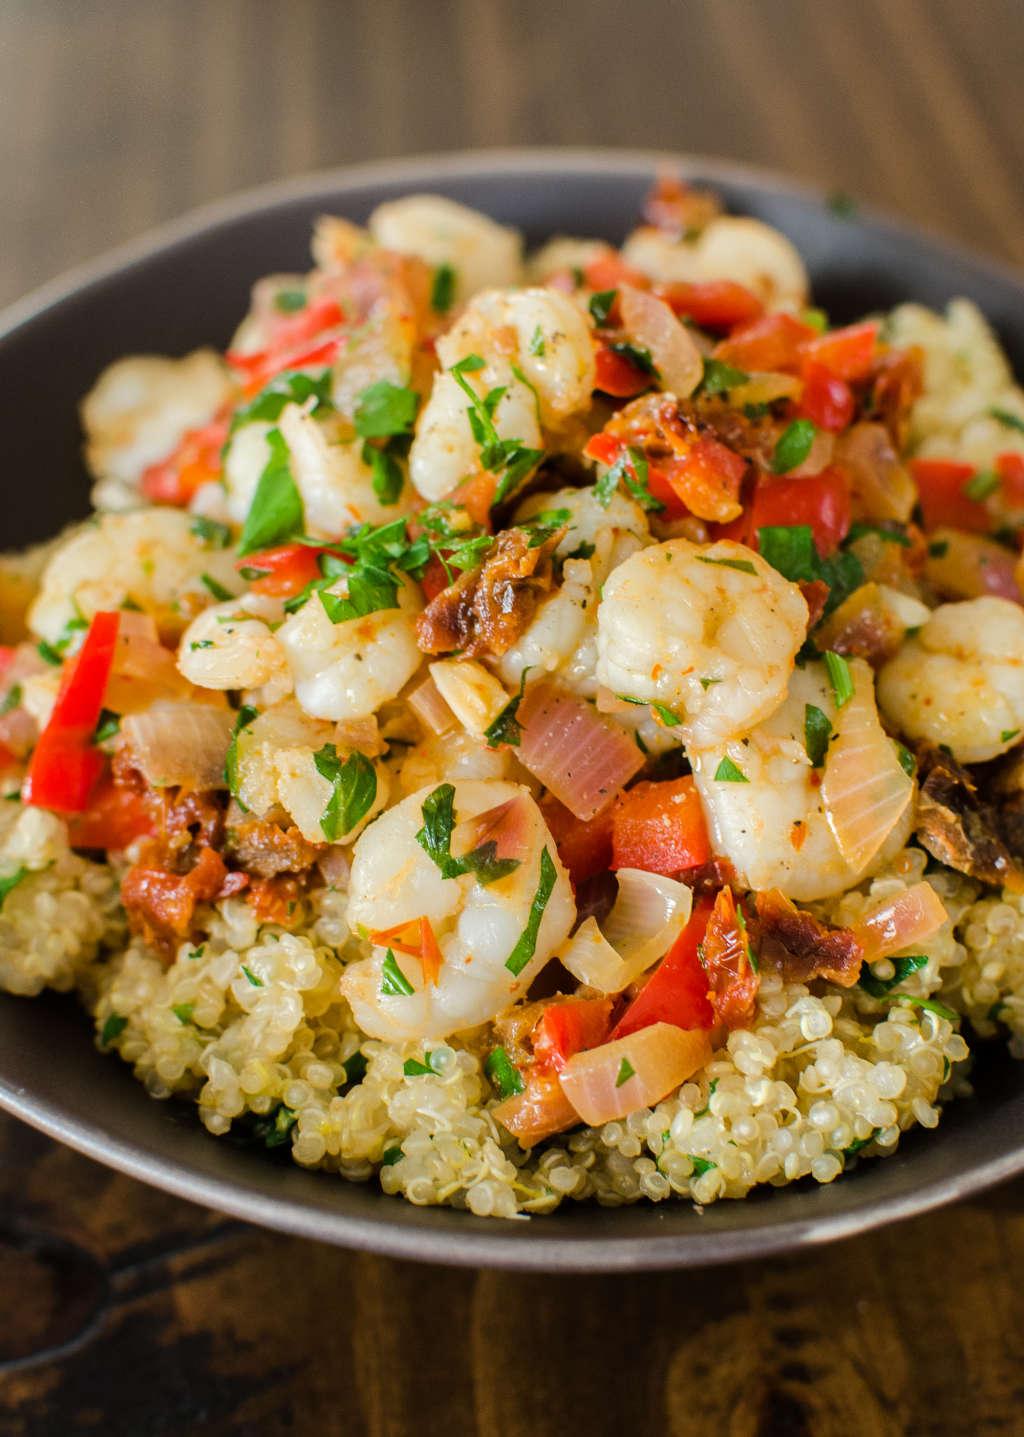 Quick Dinner Recipe: Saucy Sautéed Shrimp over Lemon Quinoa